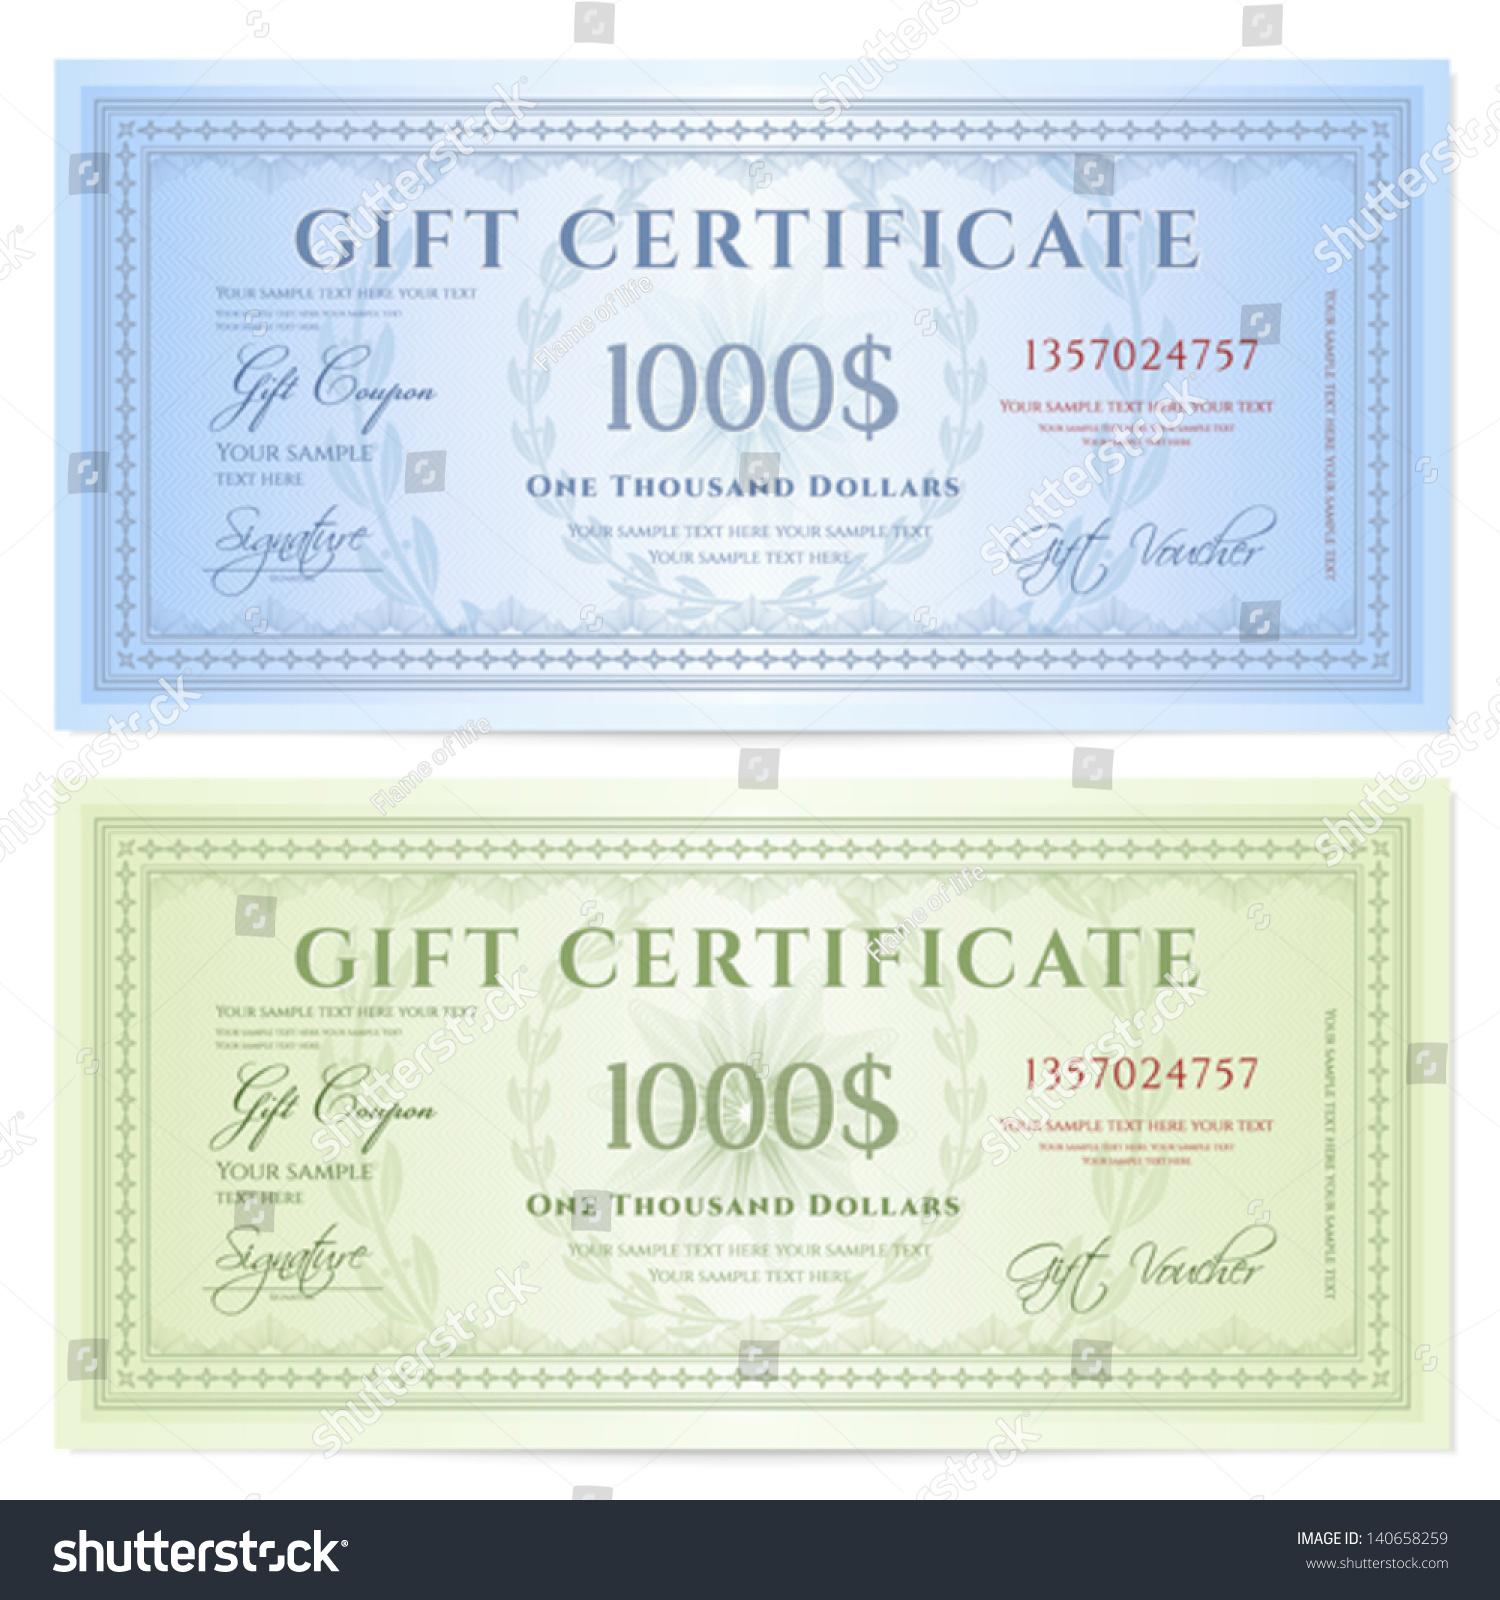 Cash Voucher Template rent payment receipt template word cash – Cash Voucher Template